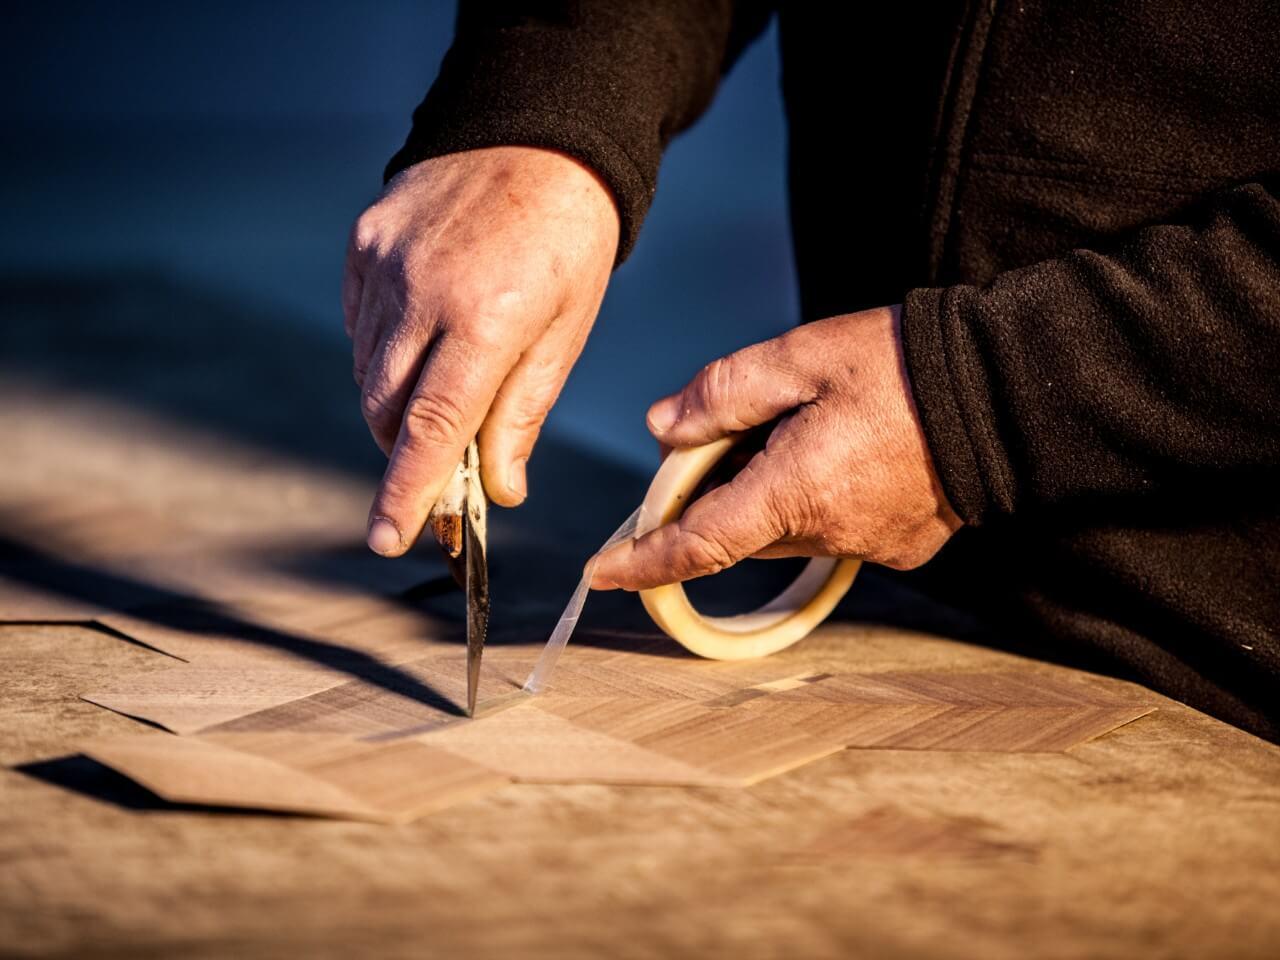 marcenaria-colecao-elementar-domkapa-handmade-bespoke-behind-the-scenes-wood-furniture-history-1